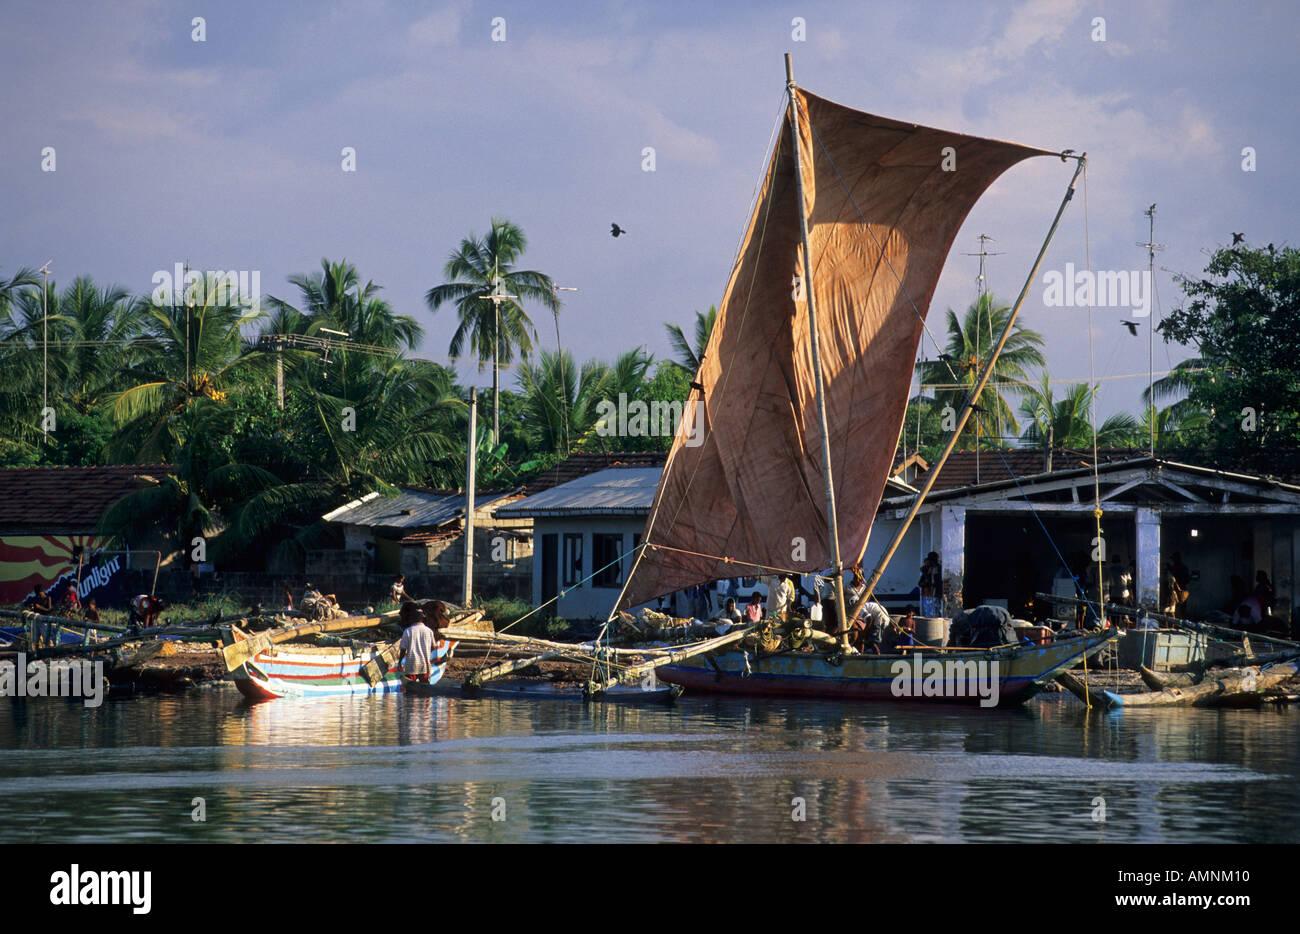 old oruvas boat in the harbor of Negombo Stock Photo